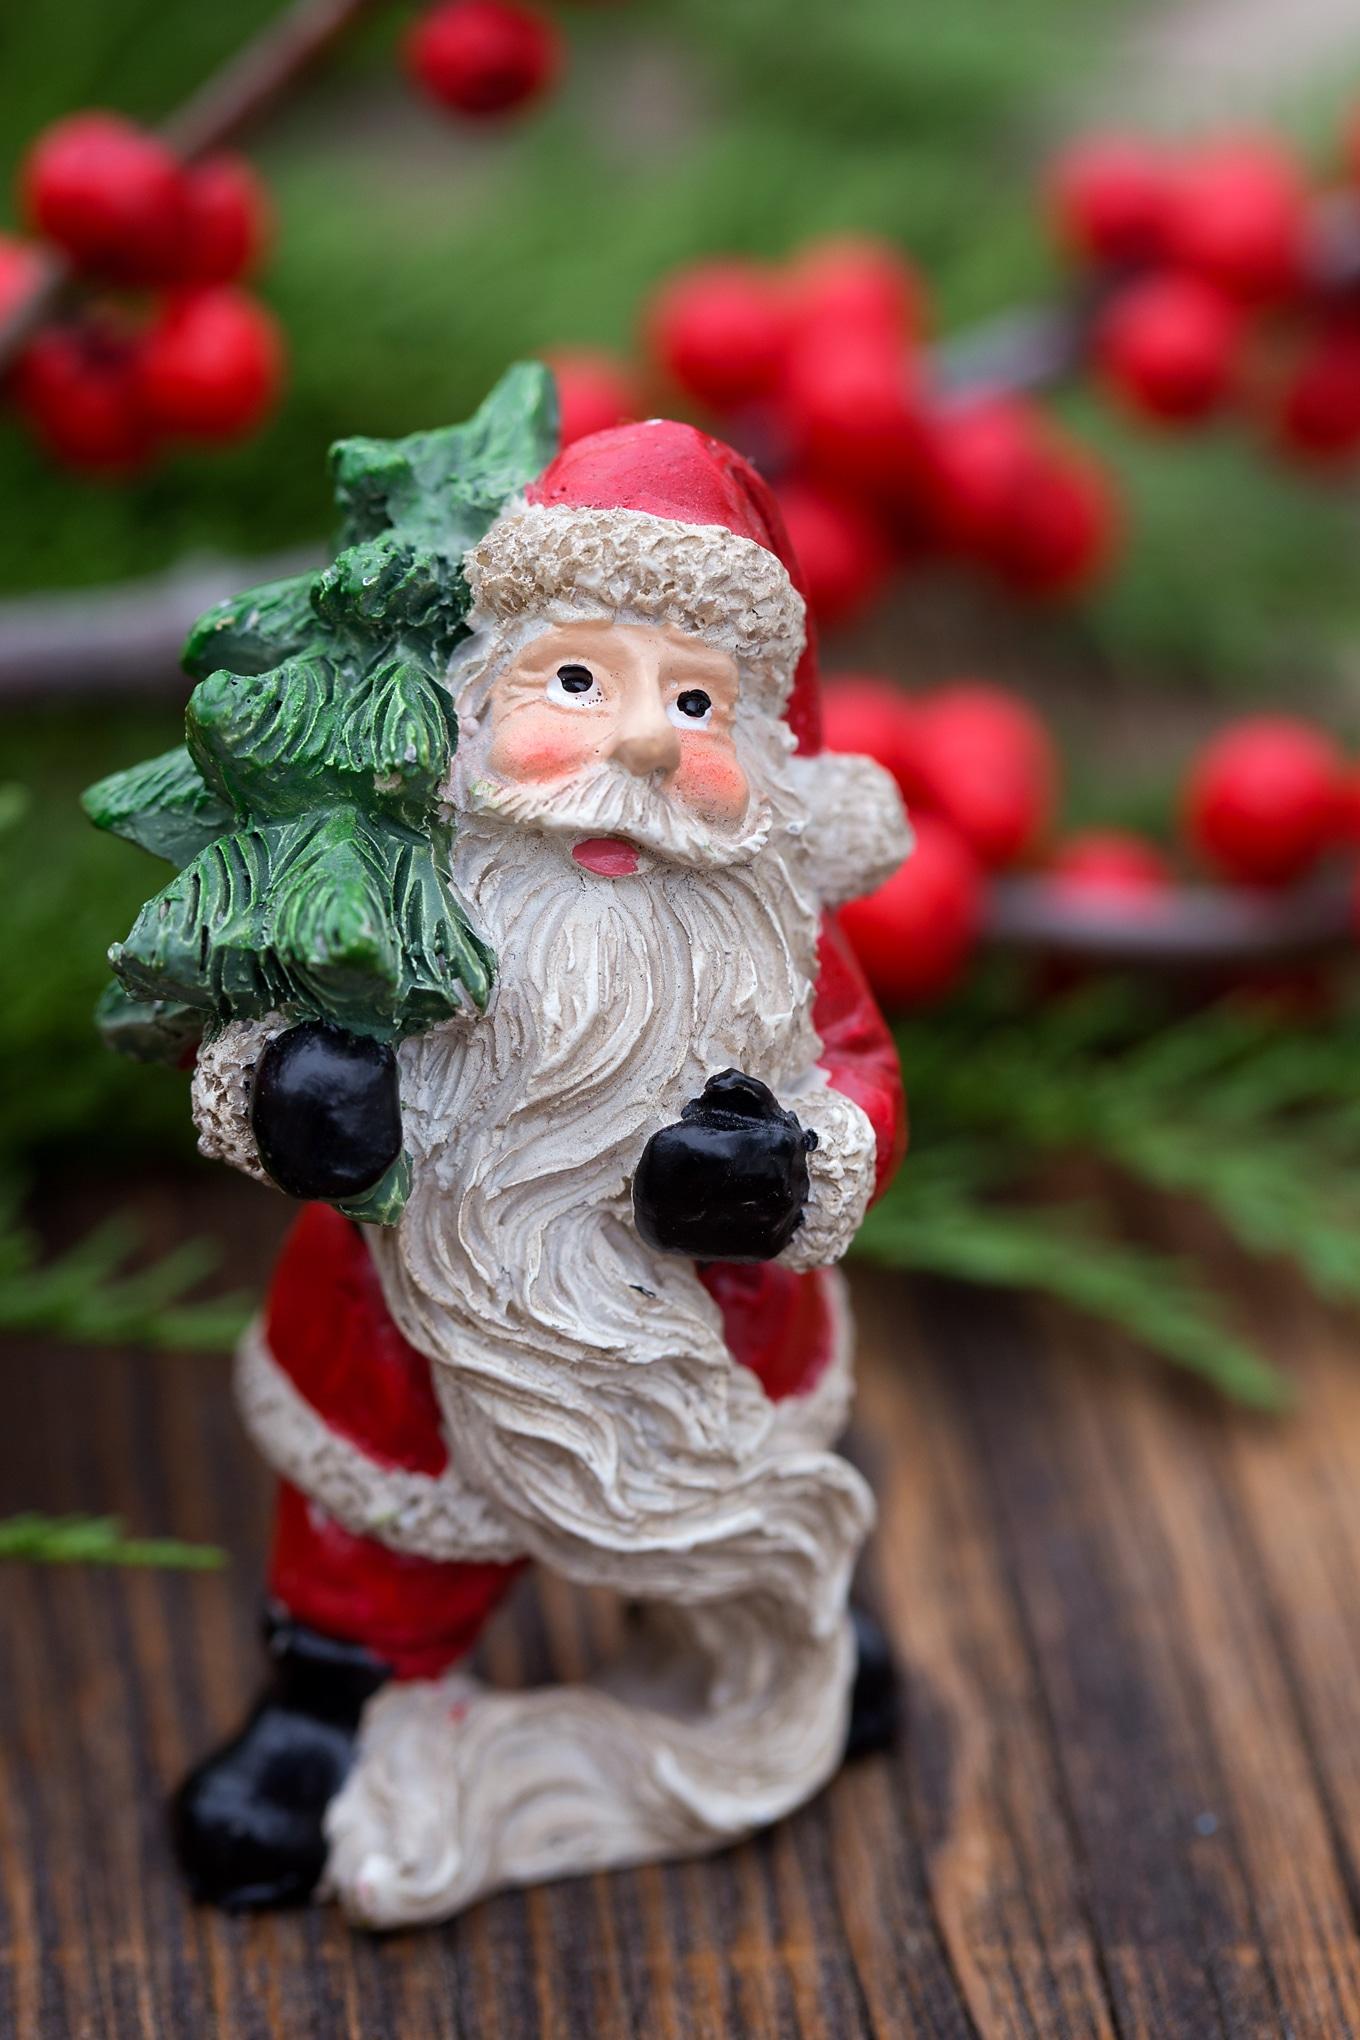 Santa Mini Figure for Christmas Teacup Garden